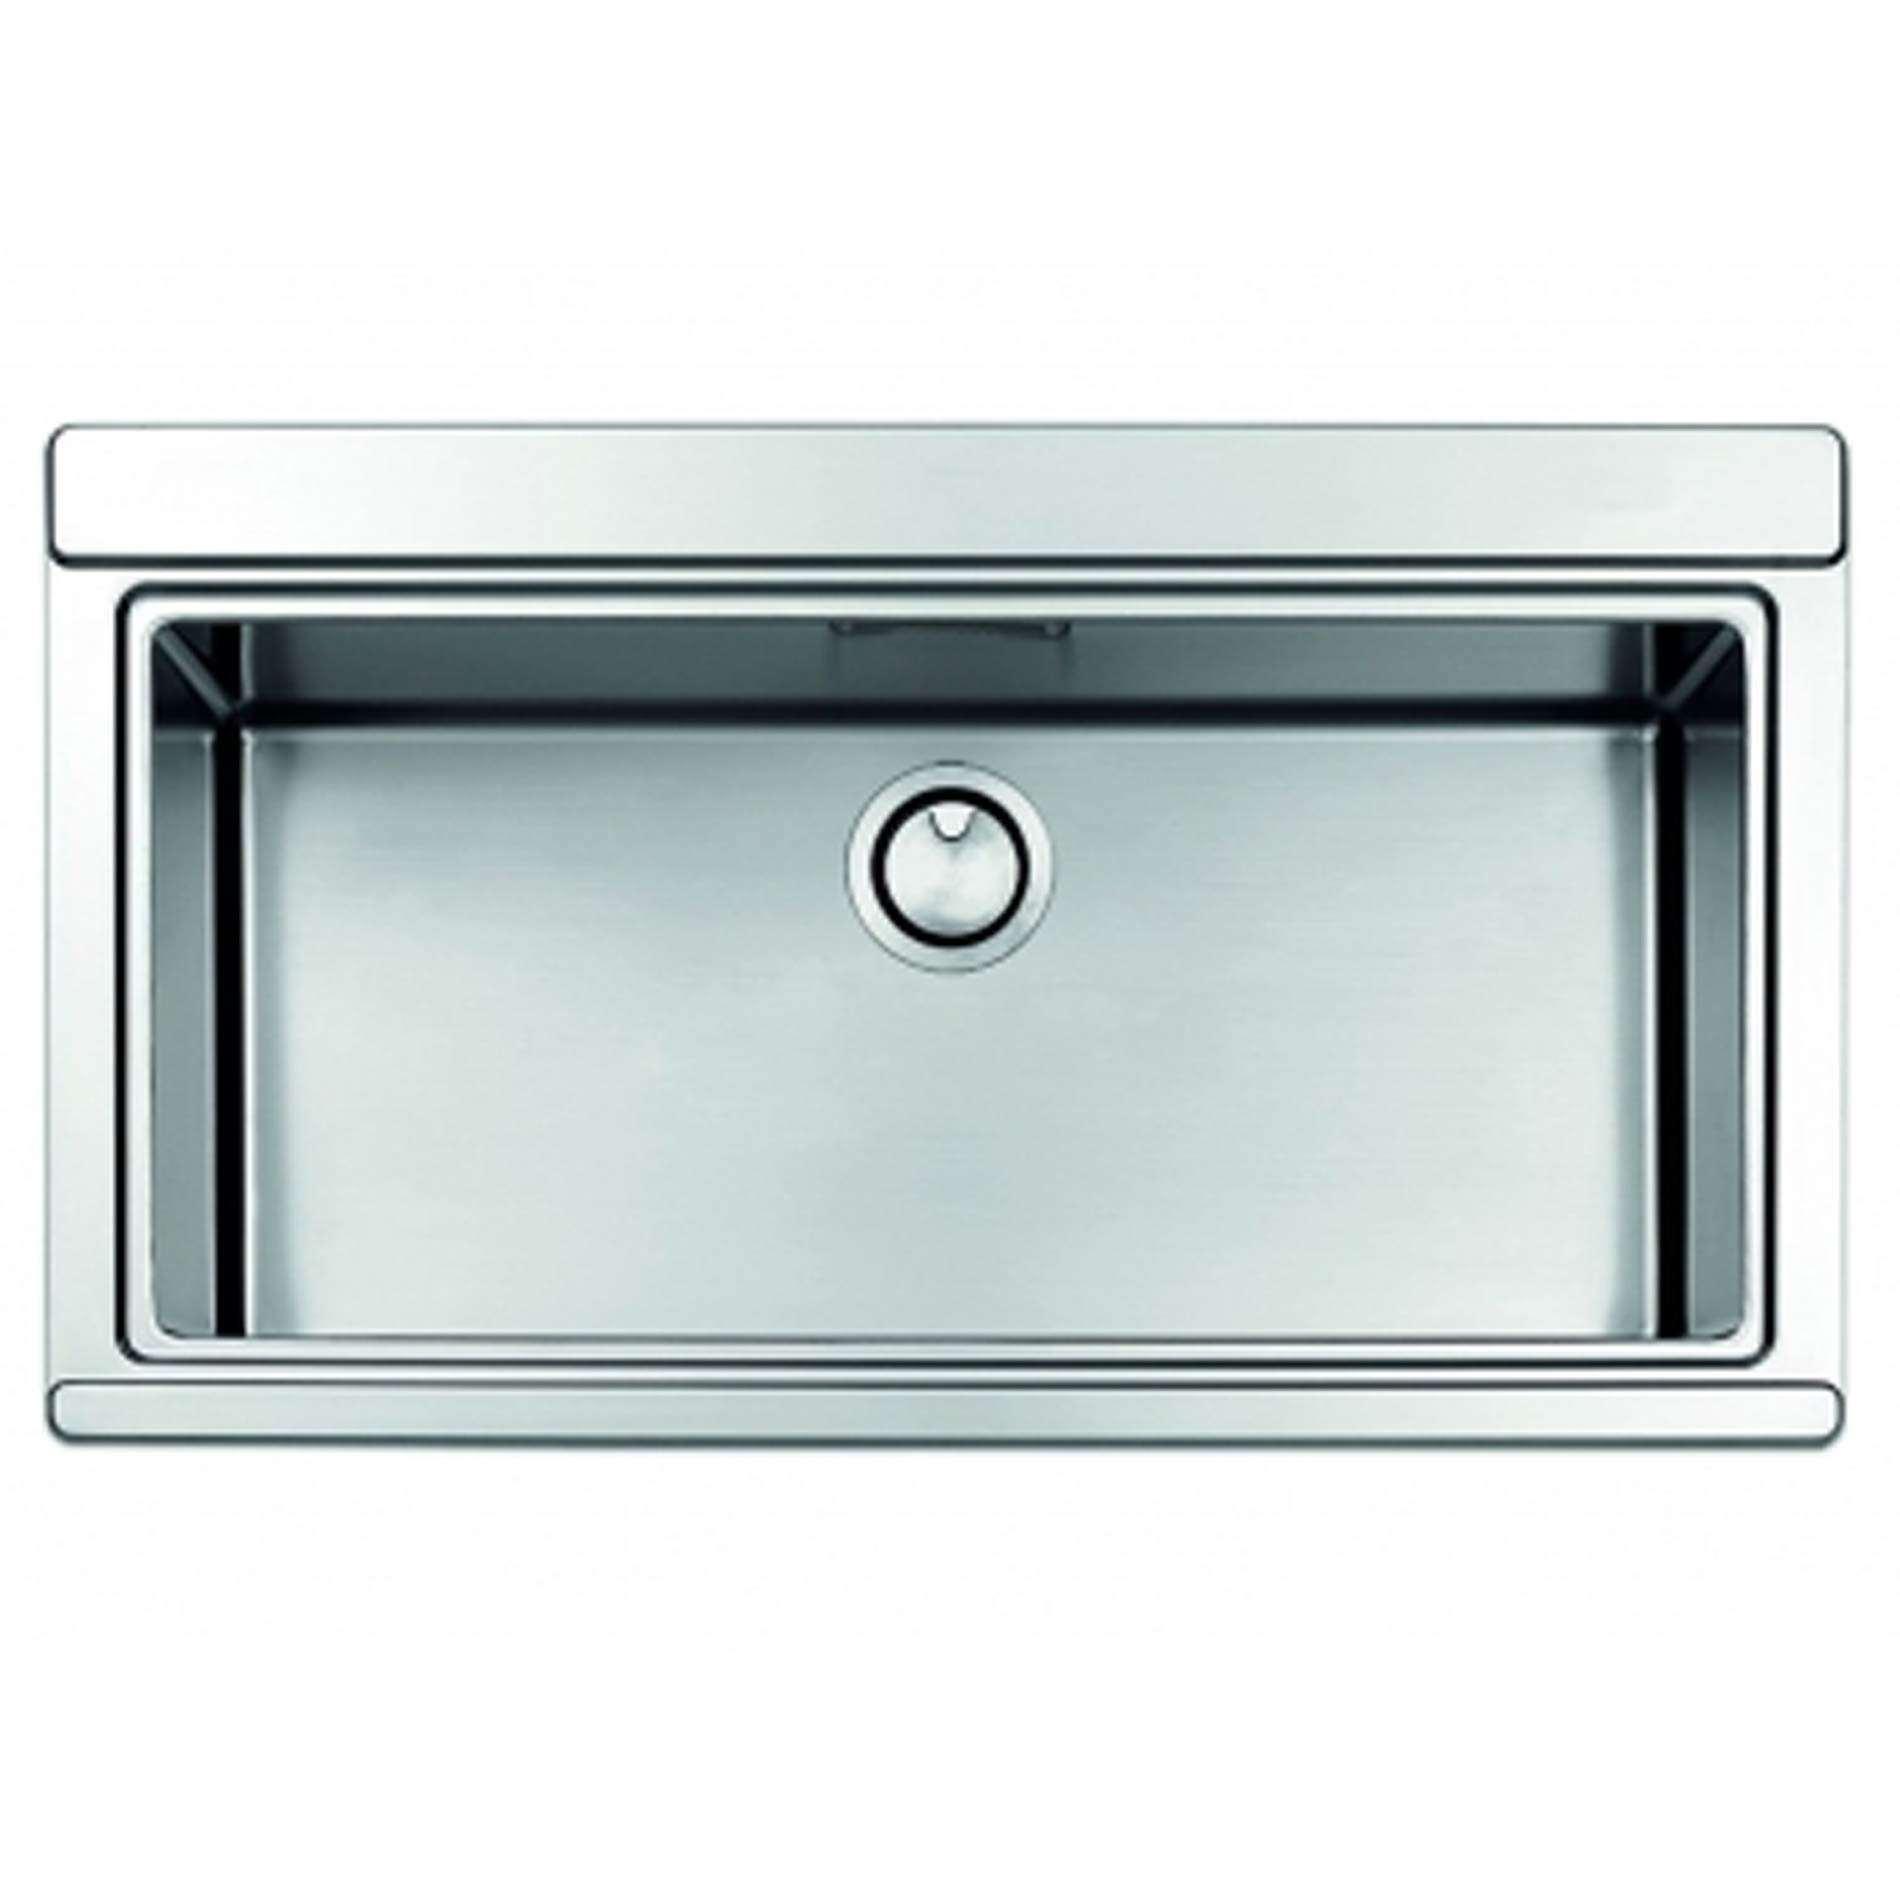 Clearwater: Glacier GLA300 Stainless Steel Sink - Kitchen Sinks & Taps